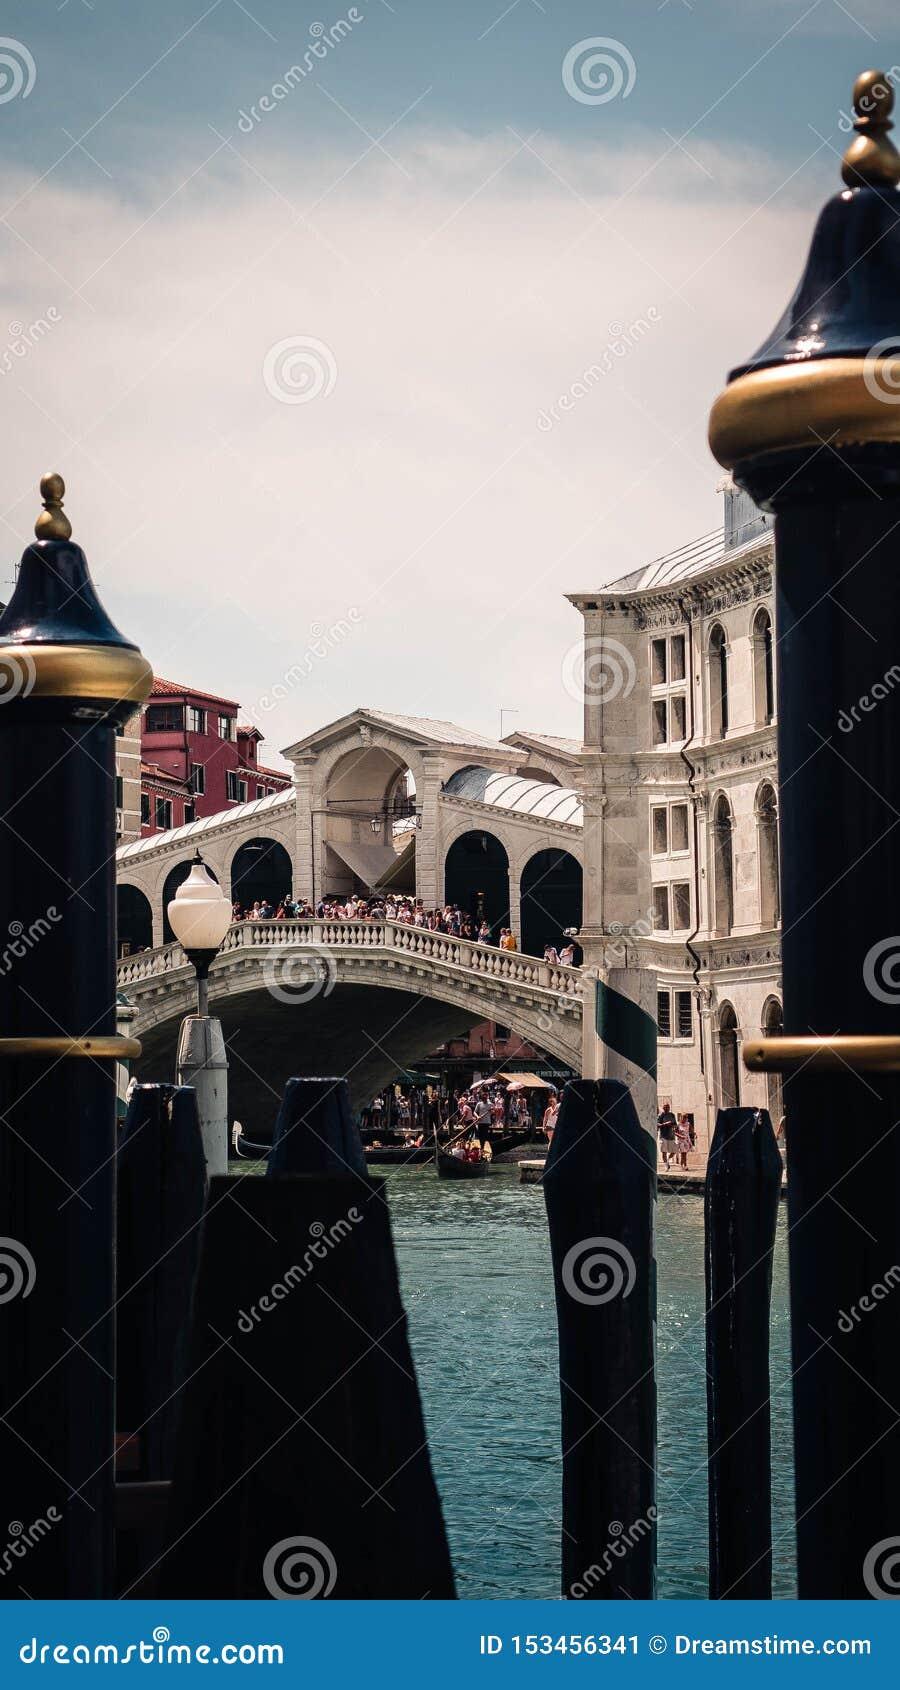 Bridge of rialto framed by poles